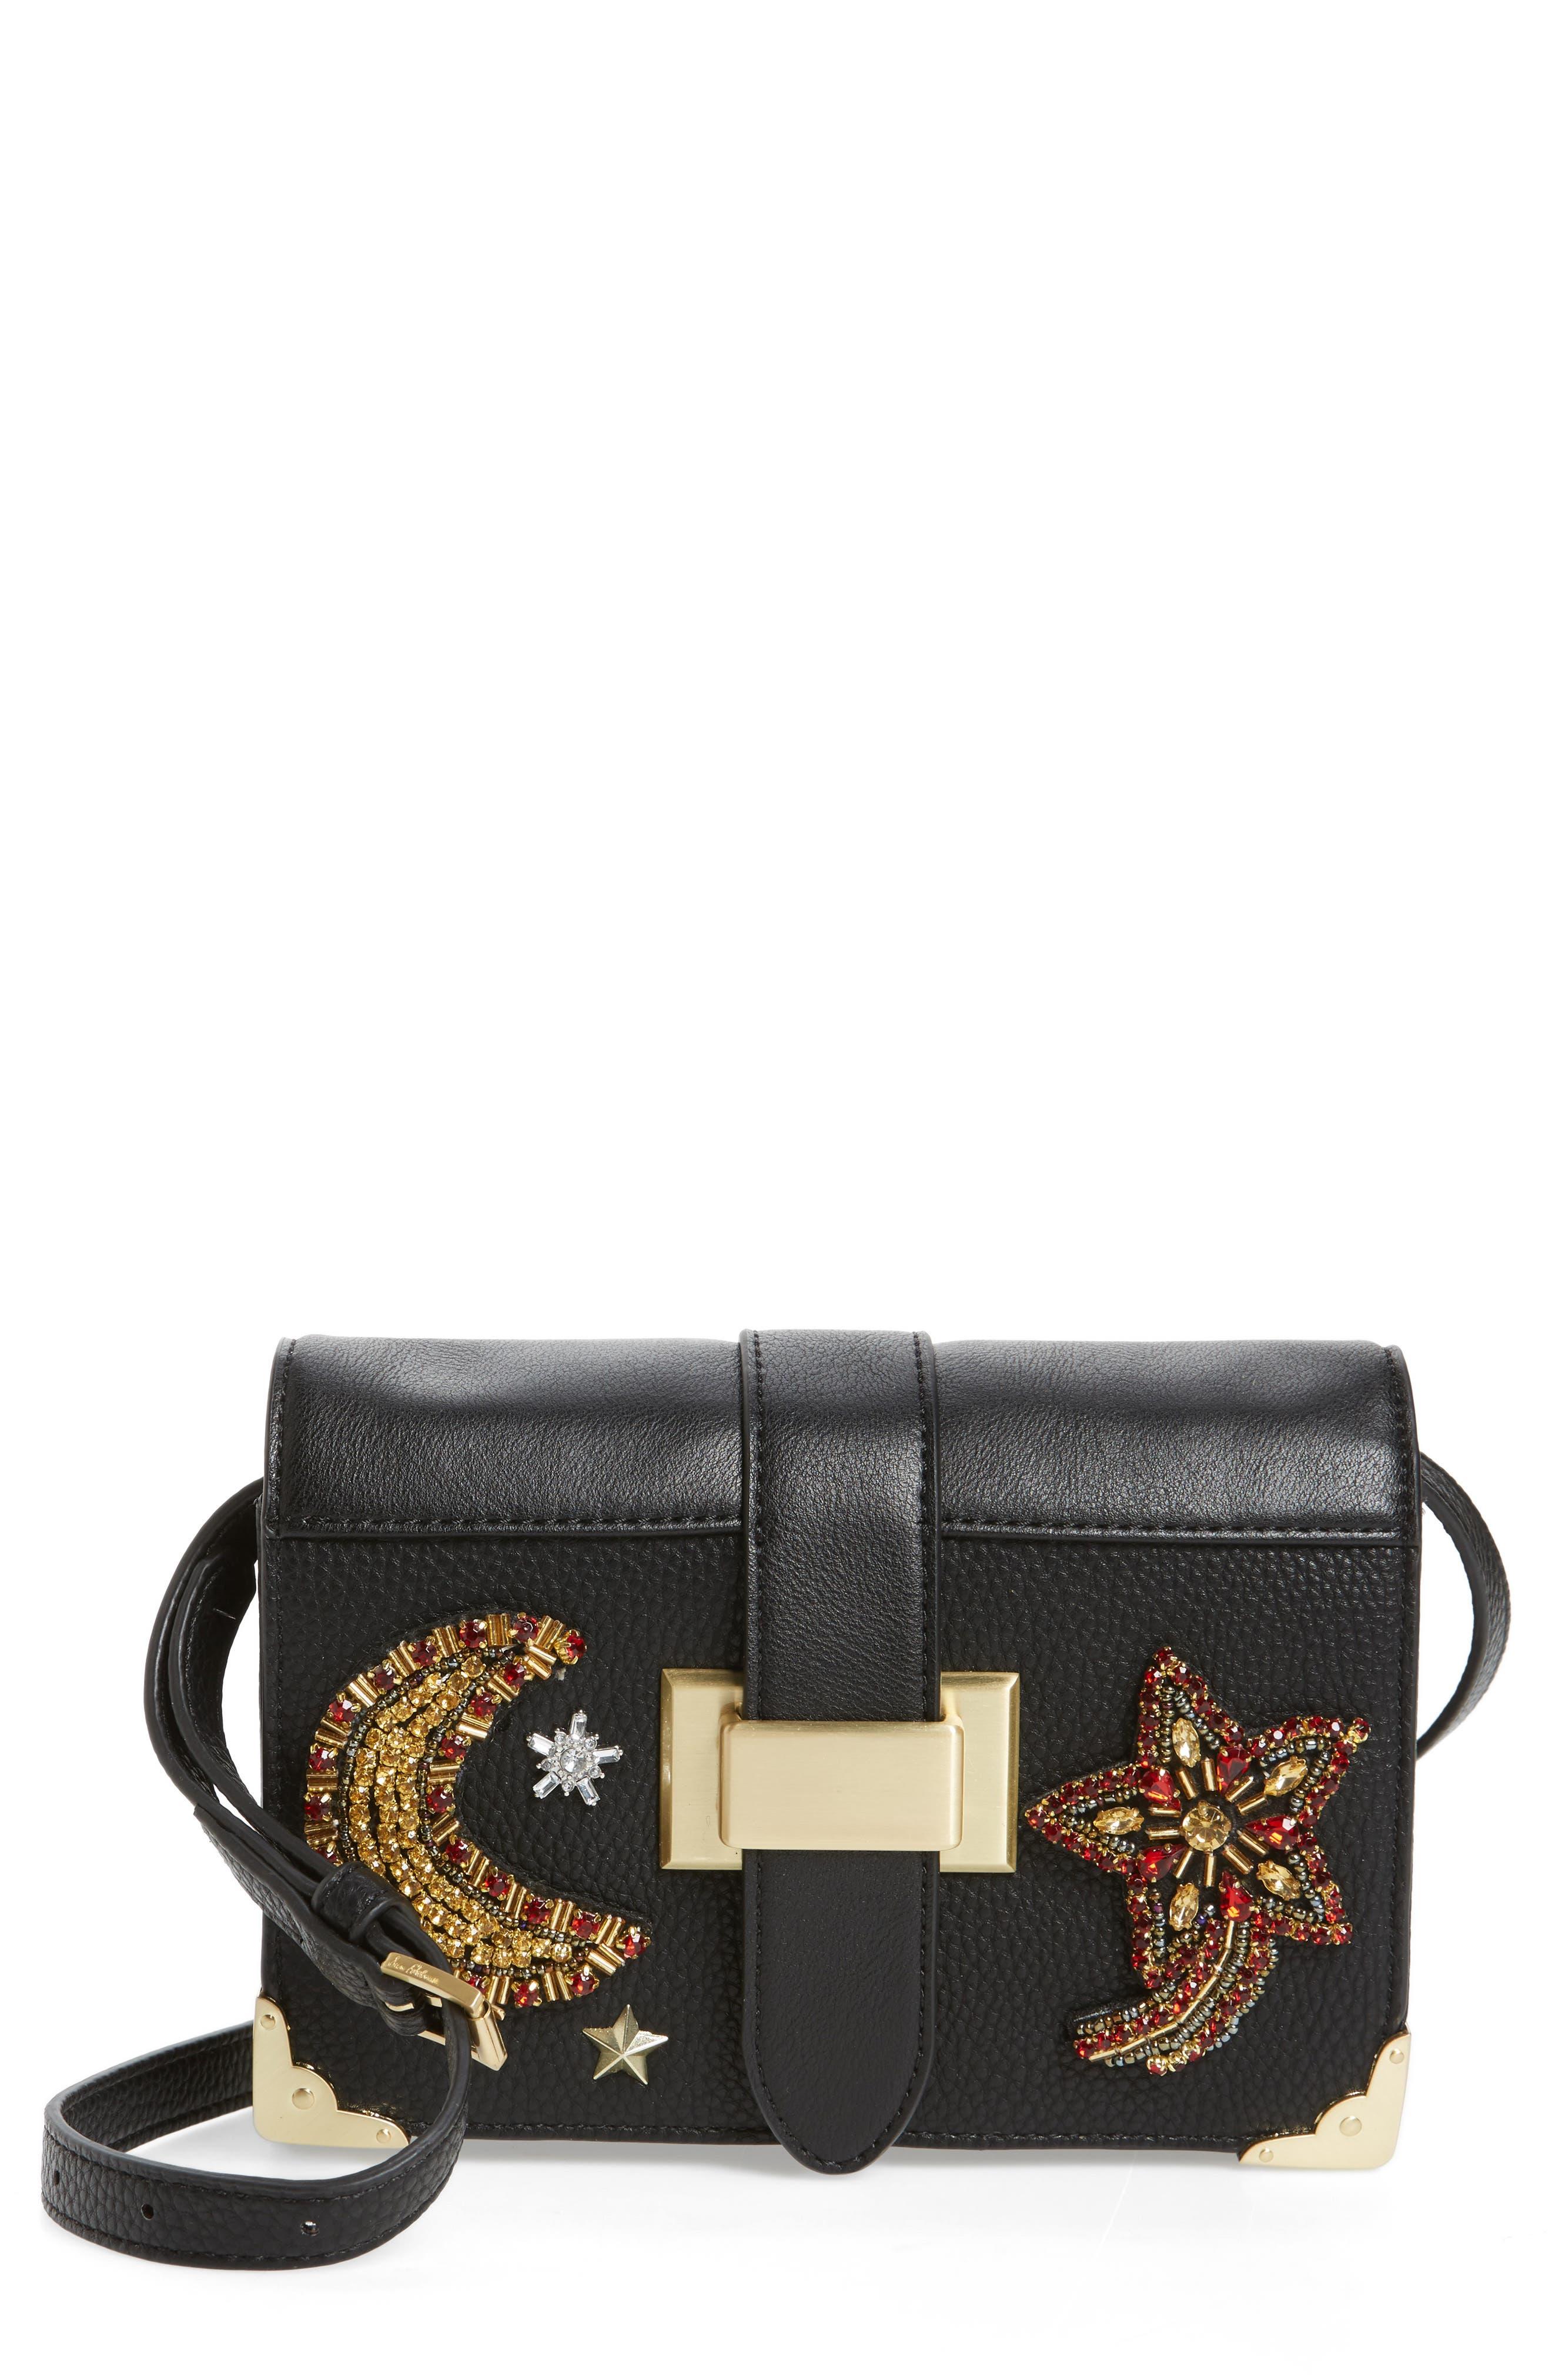 Florence Faux Leather Clutch Wallet,                             Main thumbnail 1, color,                             001